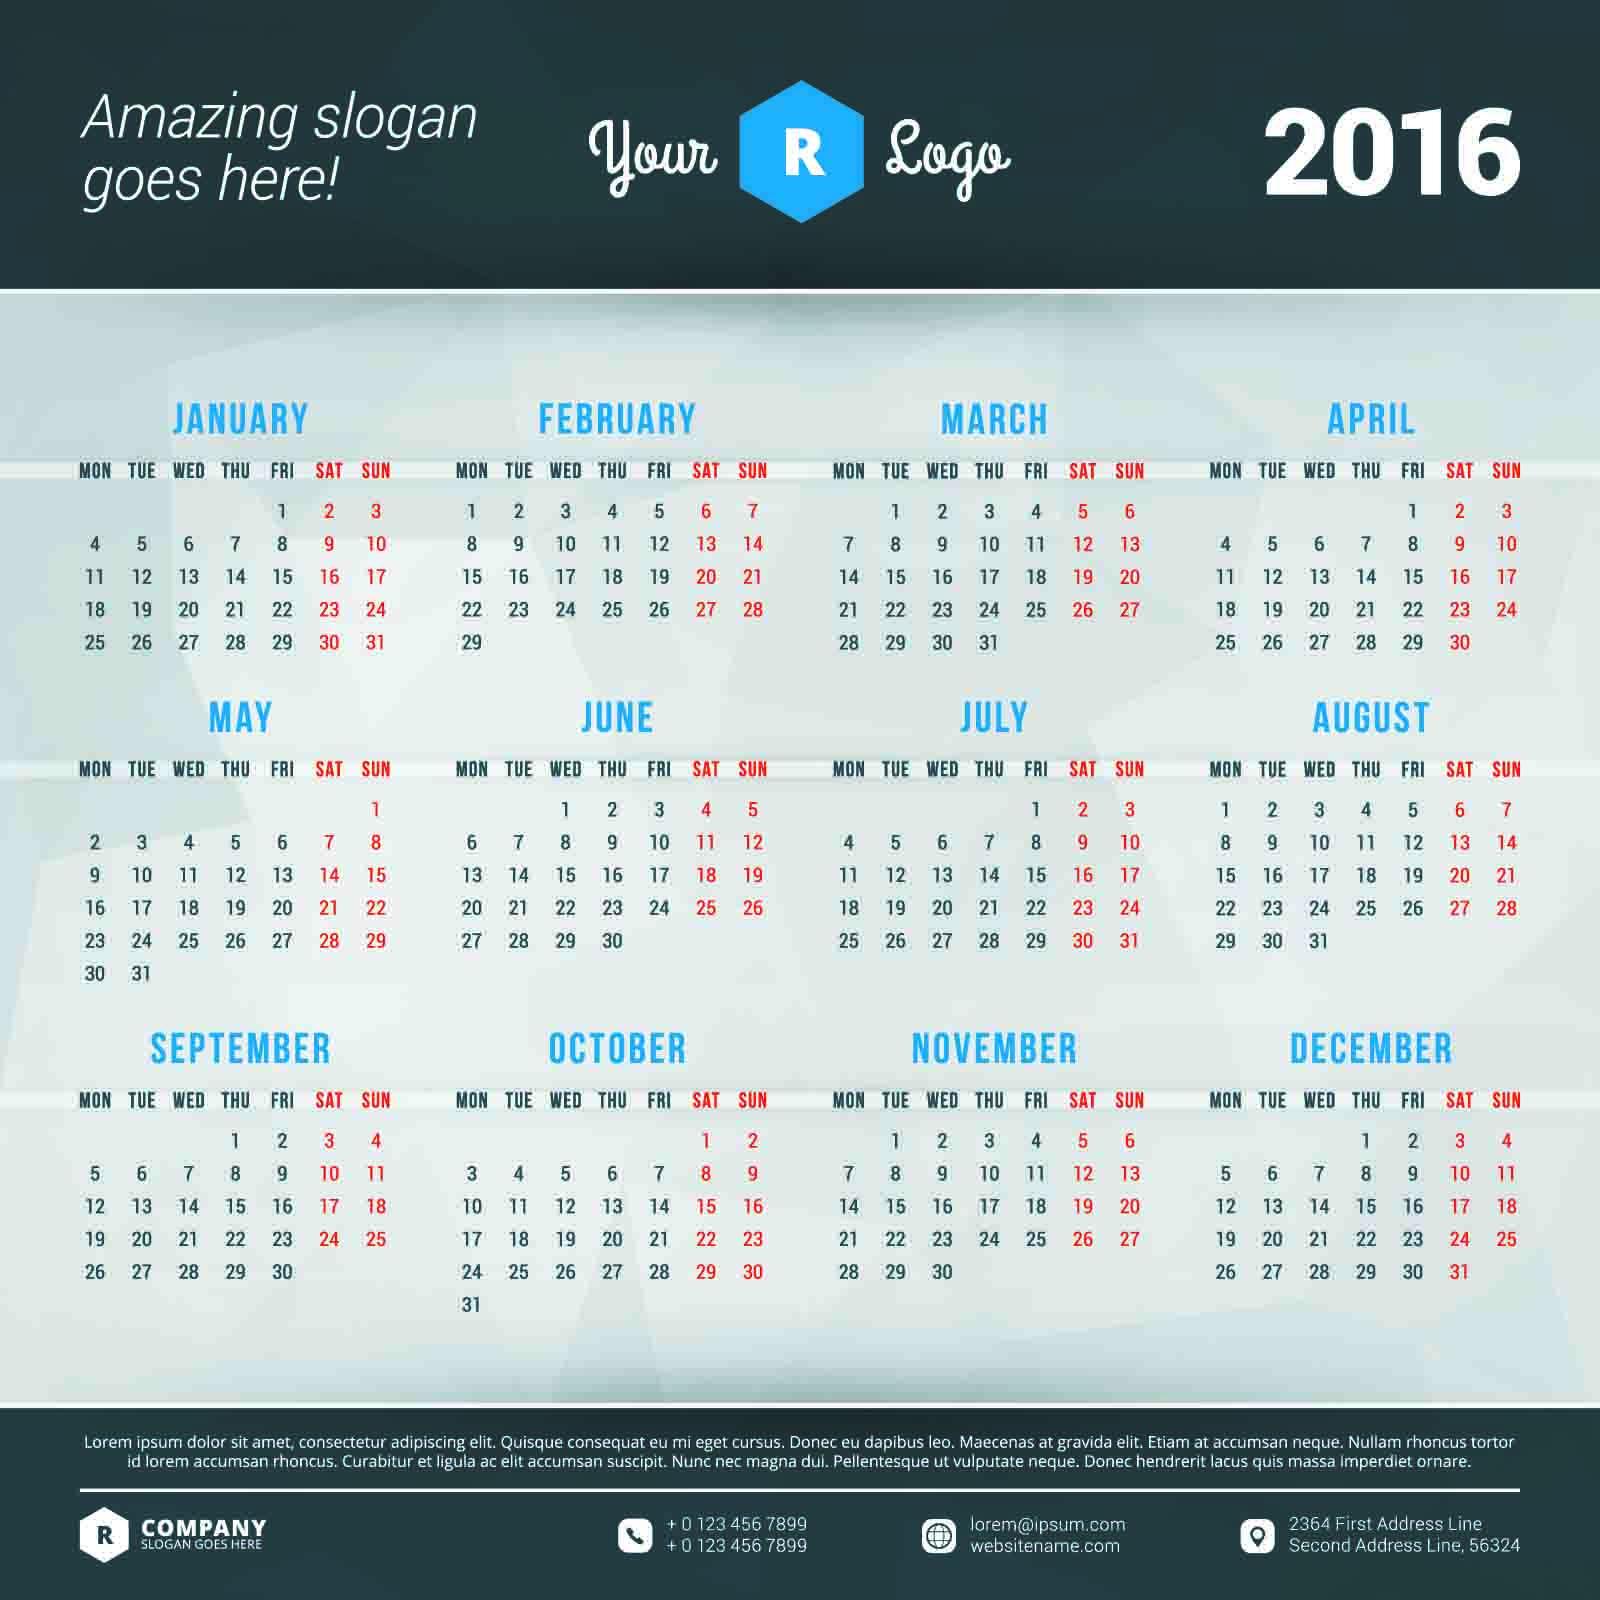 カレンダー 2 015カレンダー : 2016カレンダー無料 ...